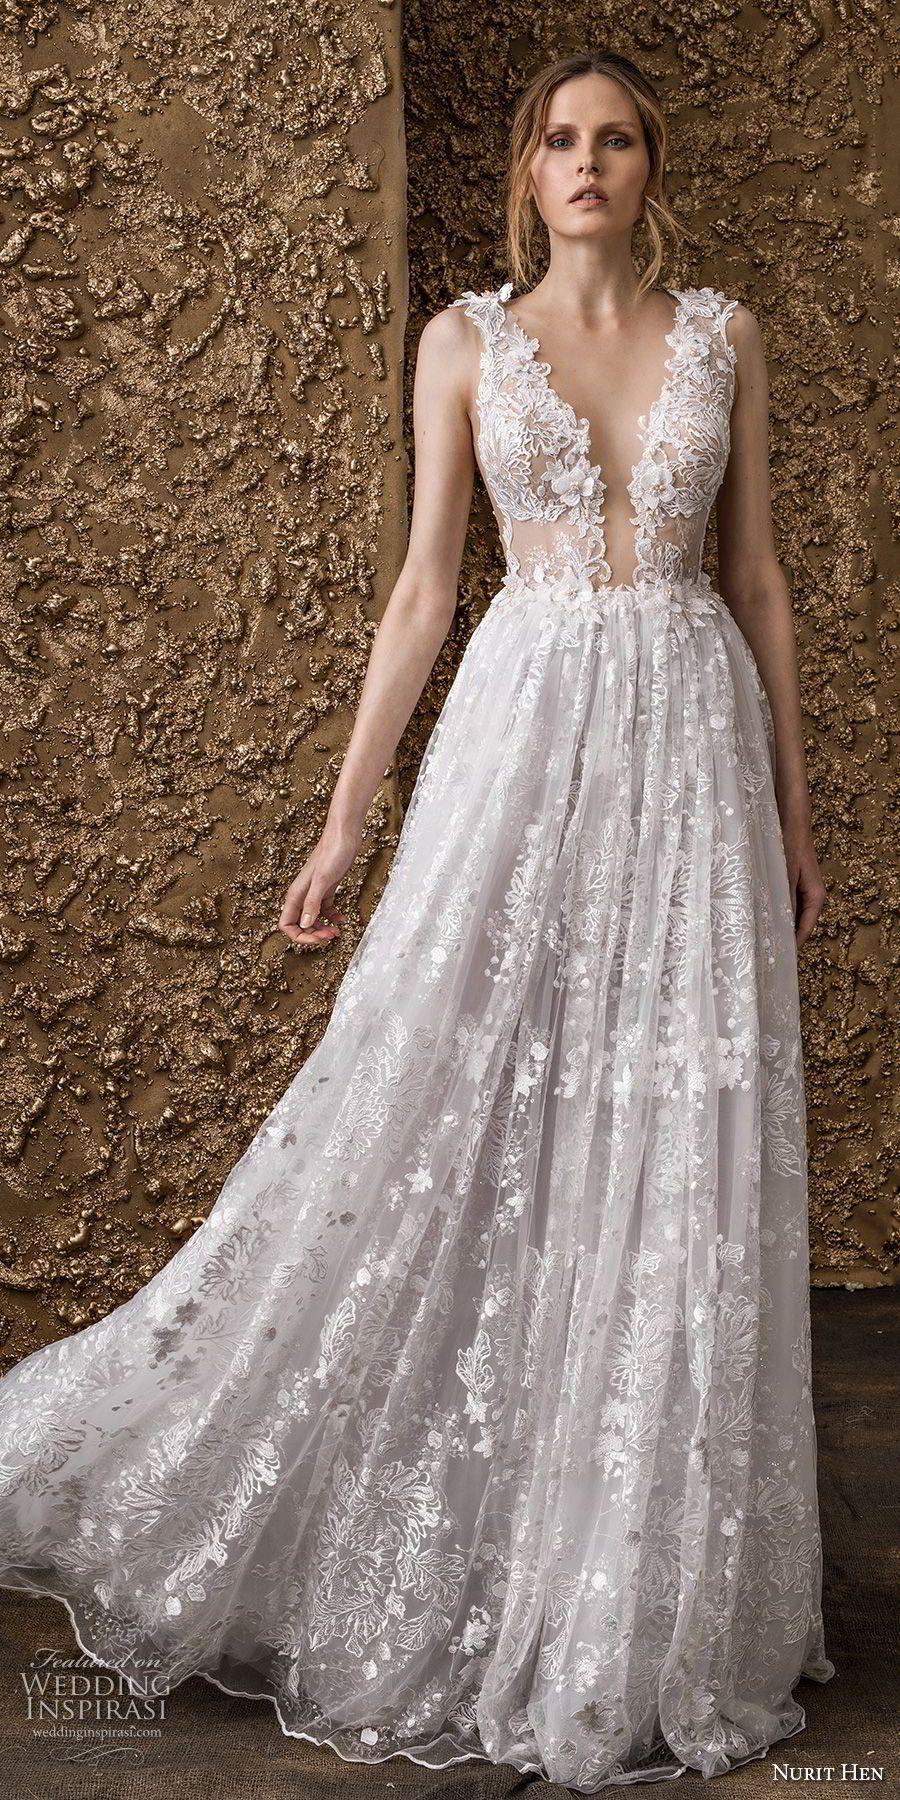 Nurit hen wedding dresses u ucgolden touchud bridal collection